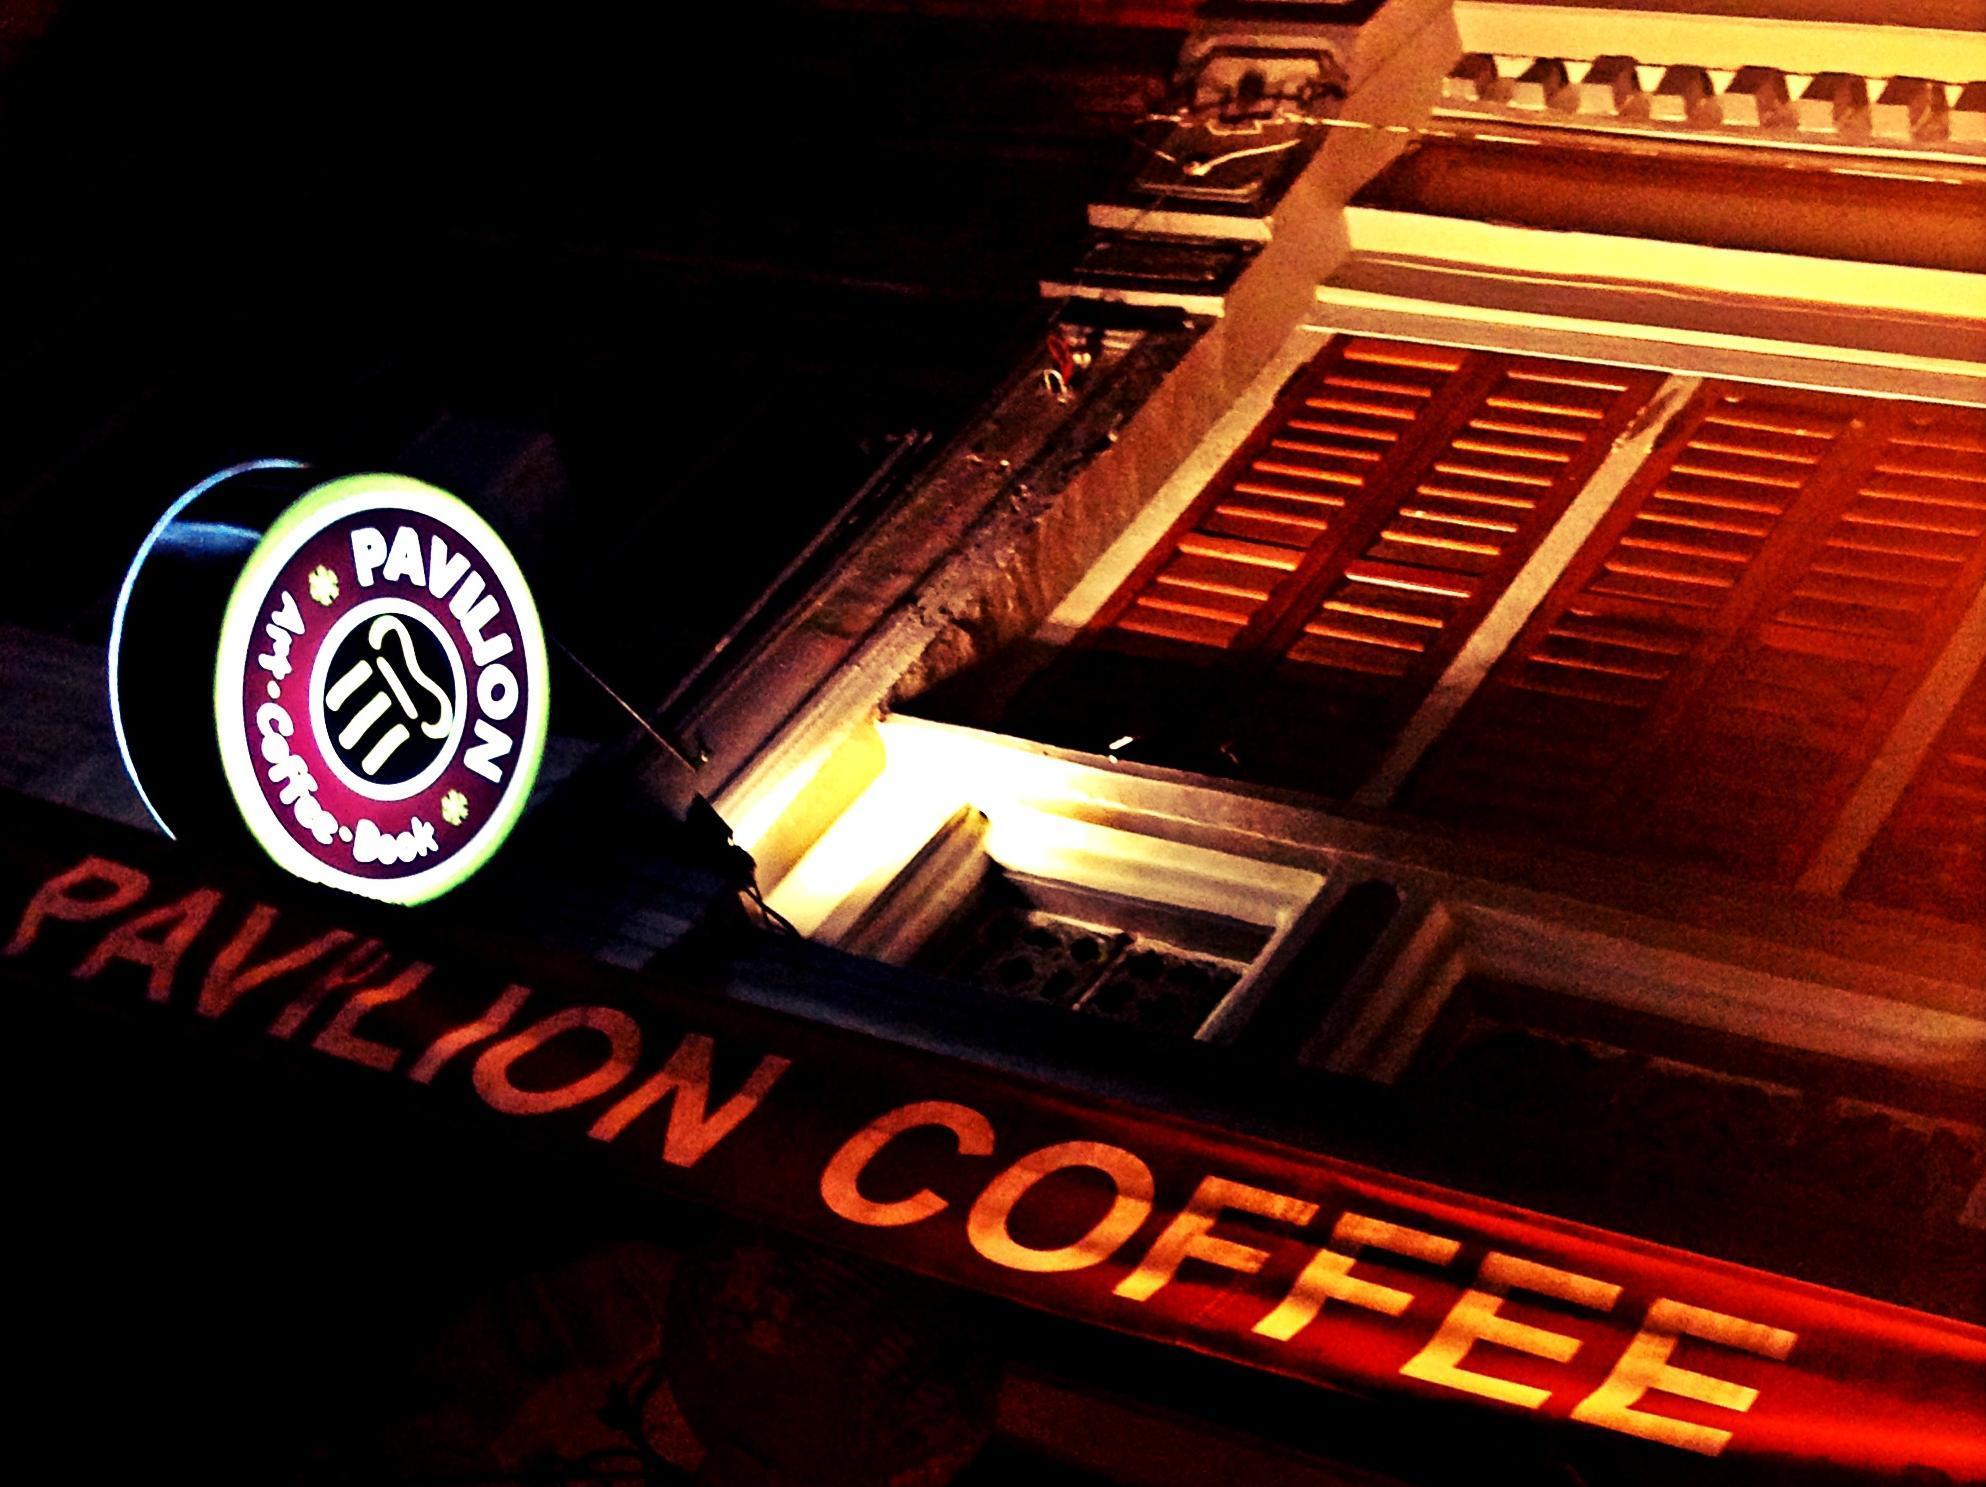 Pavilion Coffee Guest House - Penang